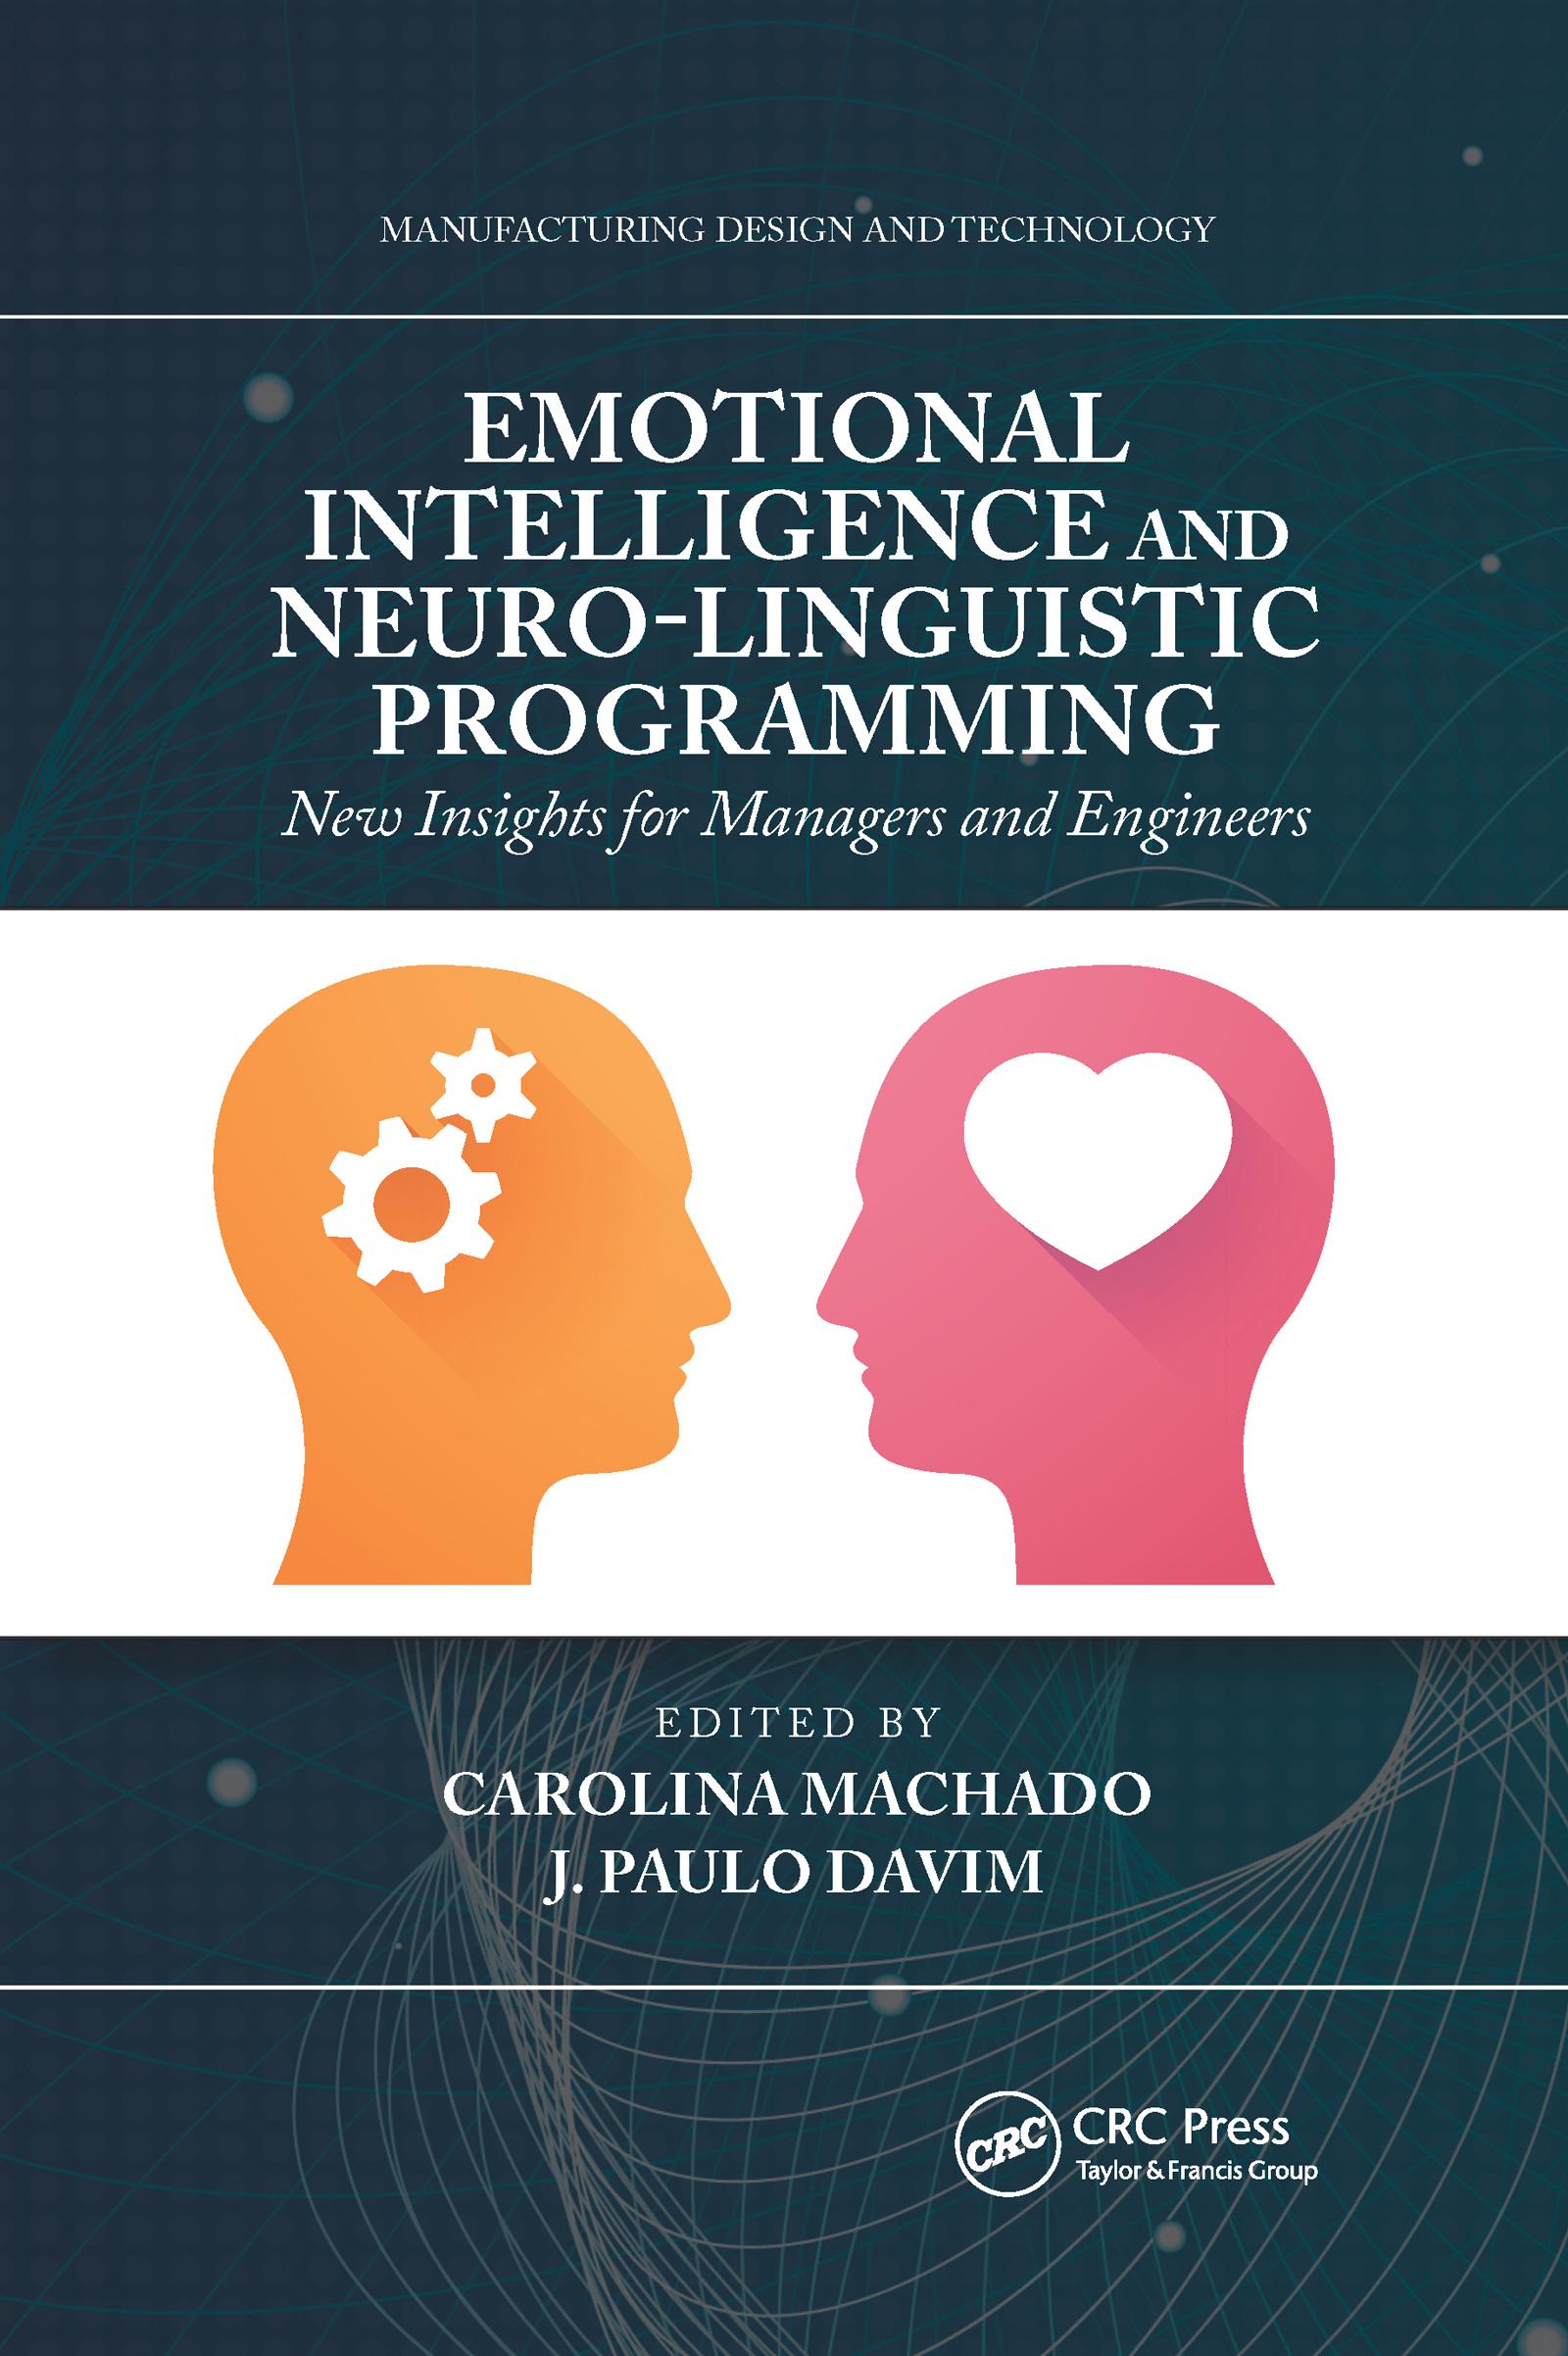 Emotional Intelligence and Neuro-Linguistic Programming